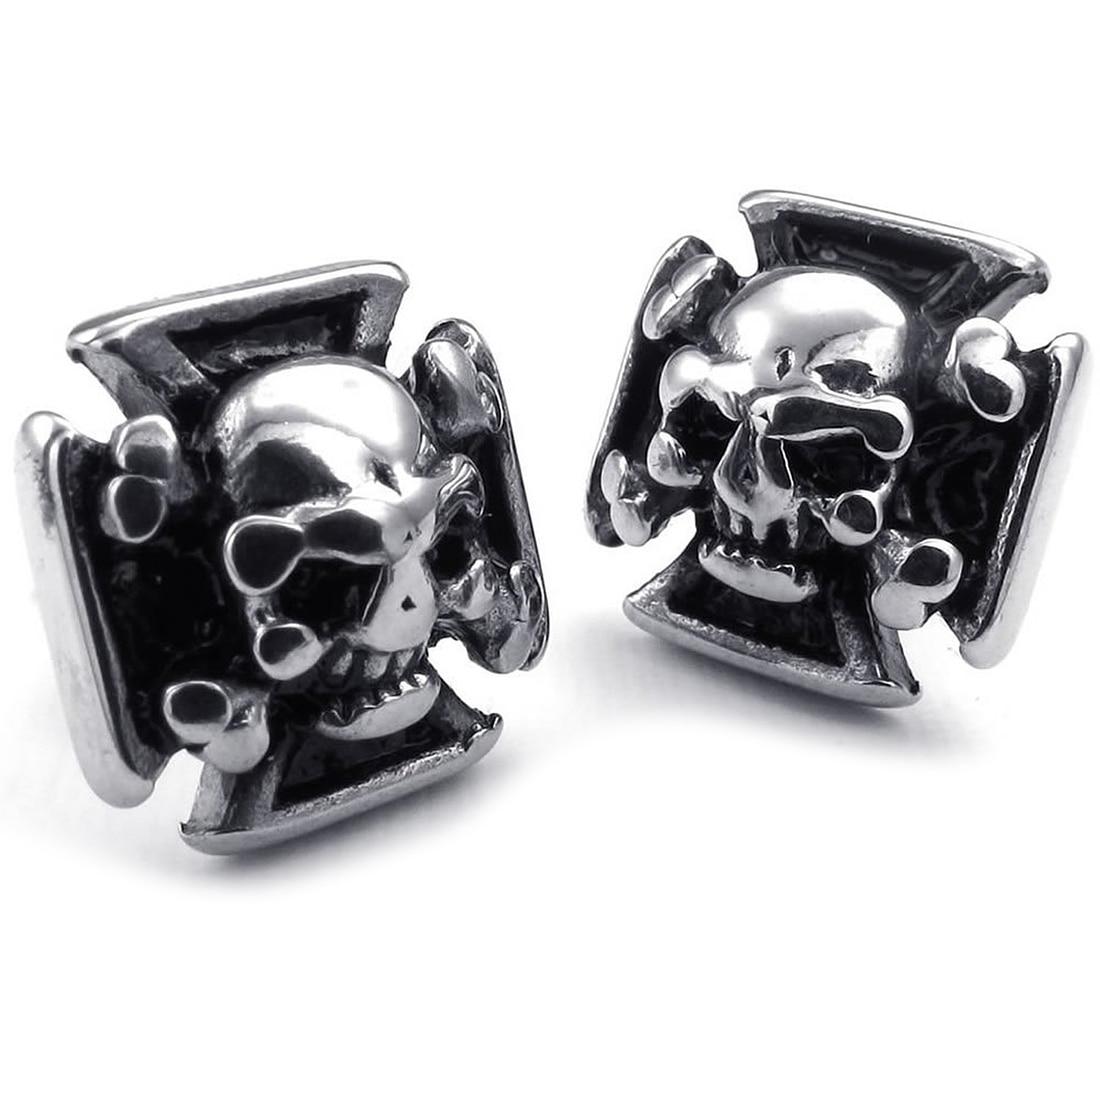 Jewelry Earrings for Men - Gothic Cross Skull Ear Studs - Stainless Steel - for Men - Black Silver - With Gift Bag